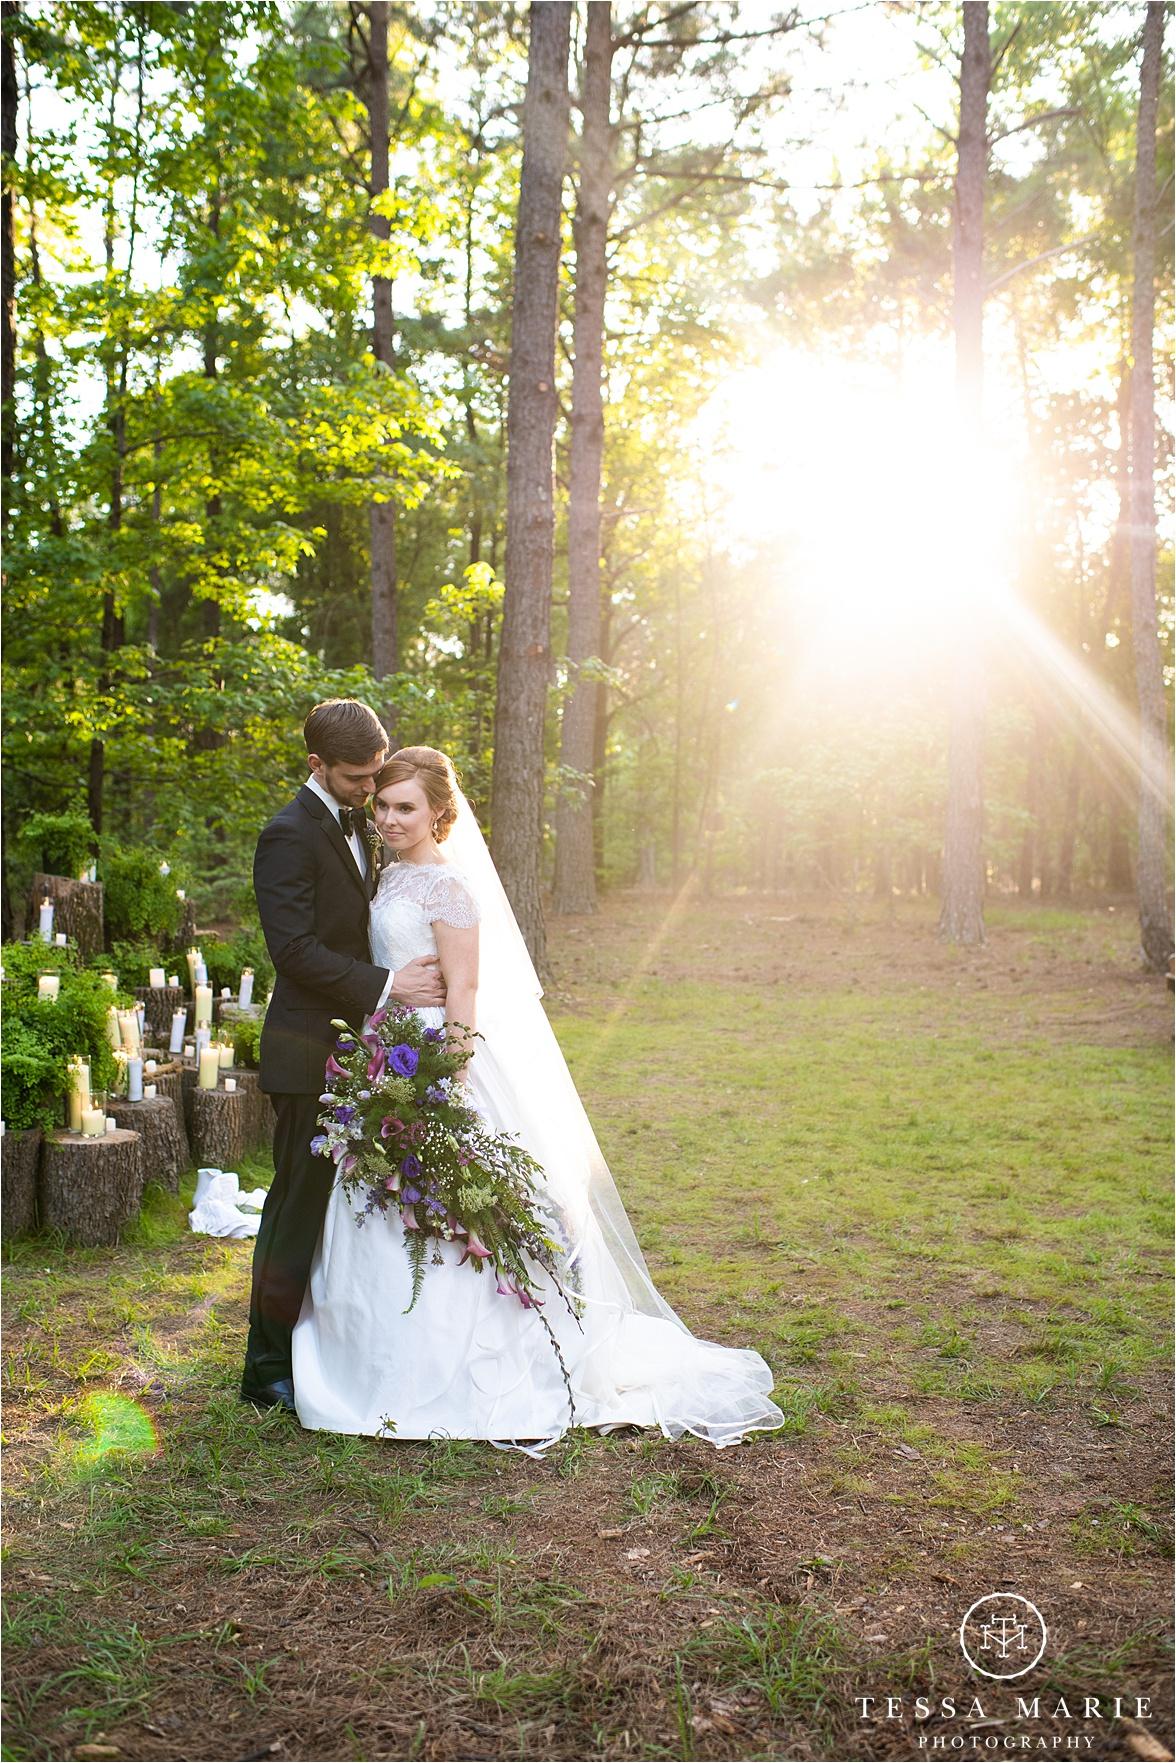 Tessa_marie_weddings_columbus_wedding_photographer_wedding_day_spring_outdoor_wedding_0119.jpg